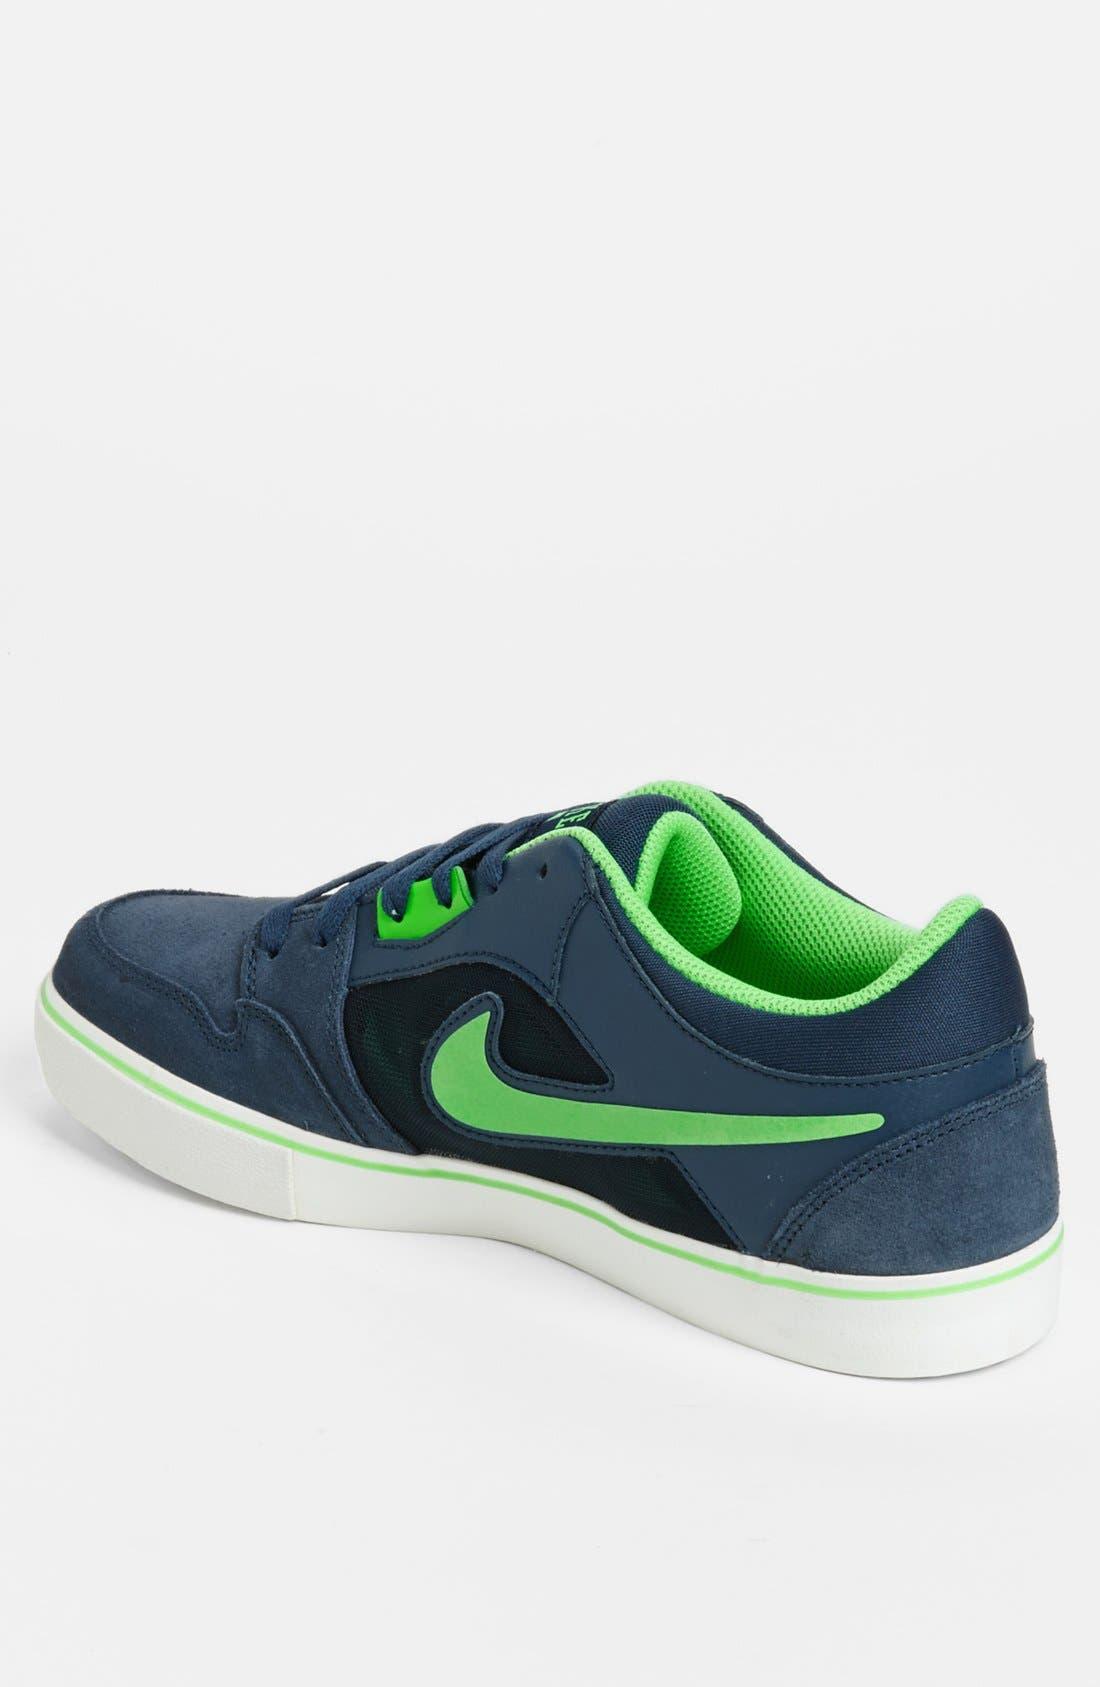 Alternate Image 2  - Nike 'Ruckus 2 LR' Skate Shoe (Men)